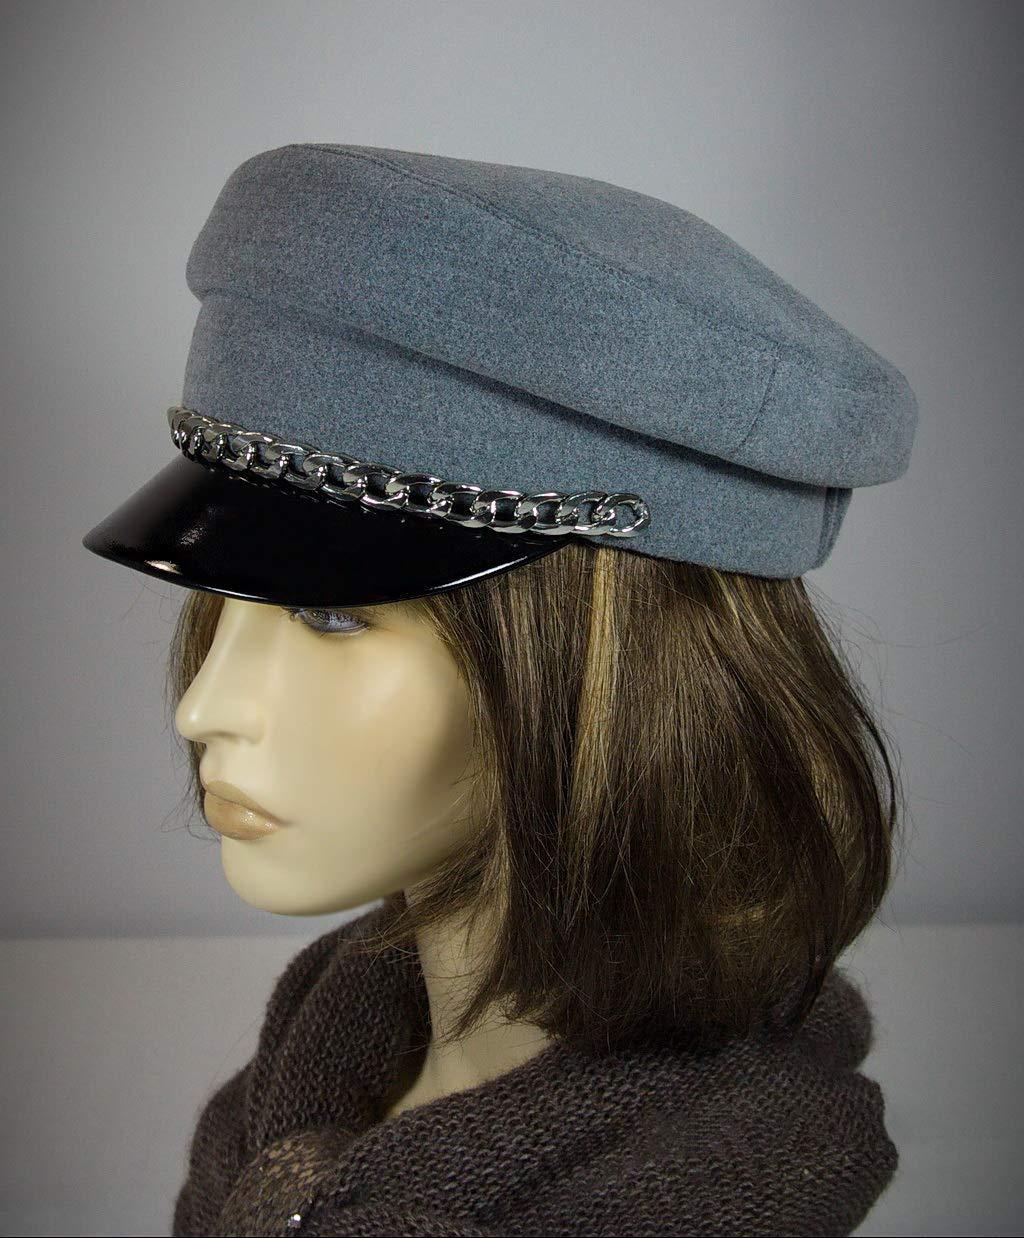 Breton hat, cap with strap, Mariner breton cap, baker cap, captains hat, breton style, baker cap, grey breton hat, cape breton hat, cap.